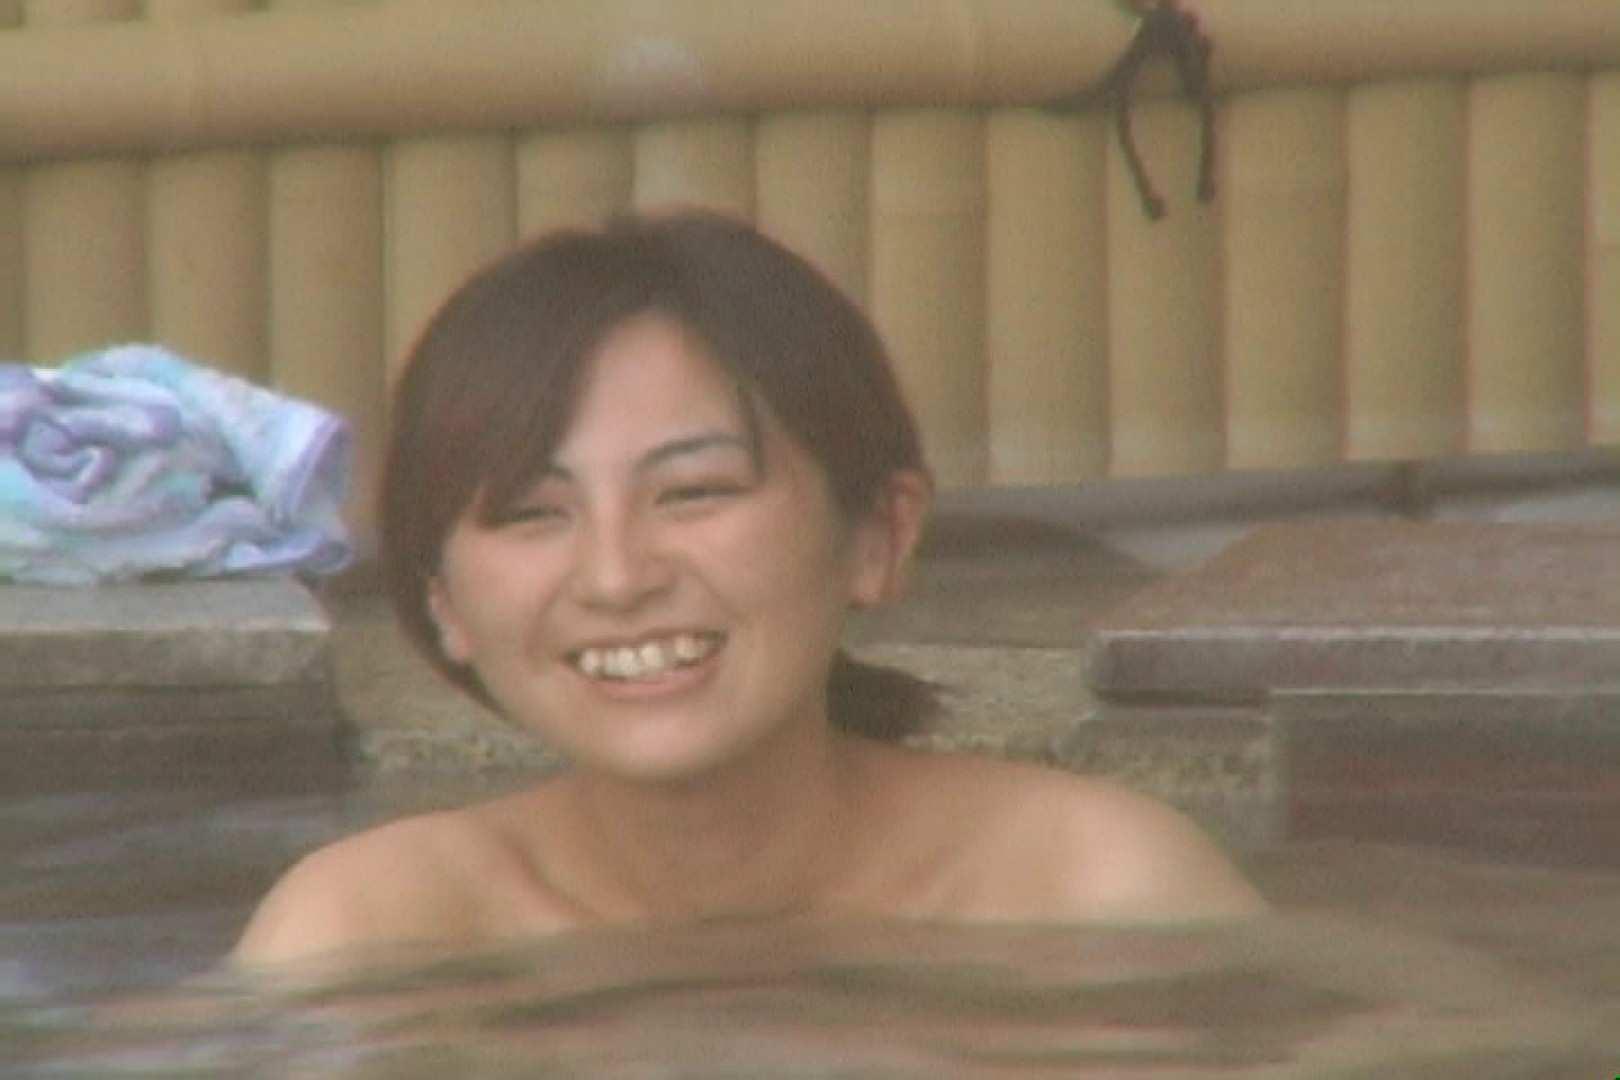 Aquaな露天風呂Vol.26【VIP】 OLセックス 盗み撮りオマンコ動画キャプチャ 59画像 32